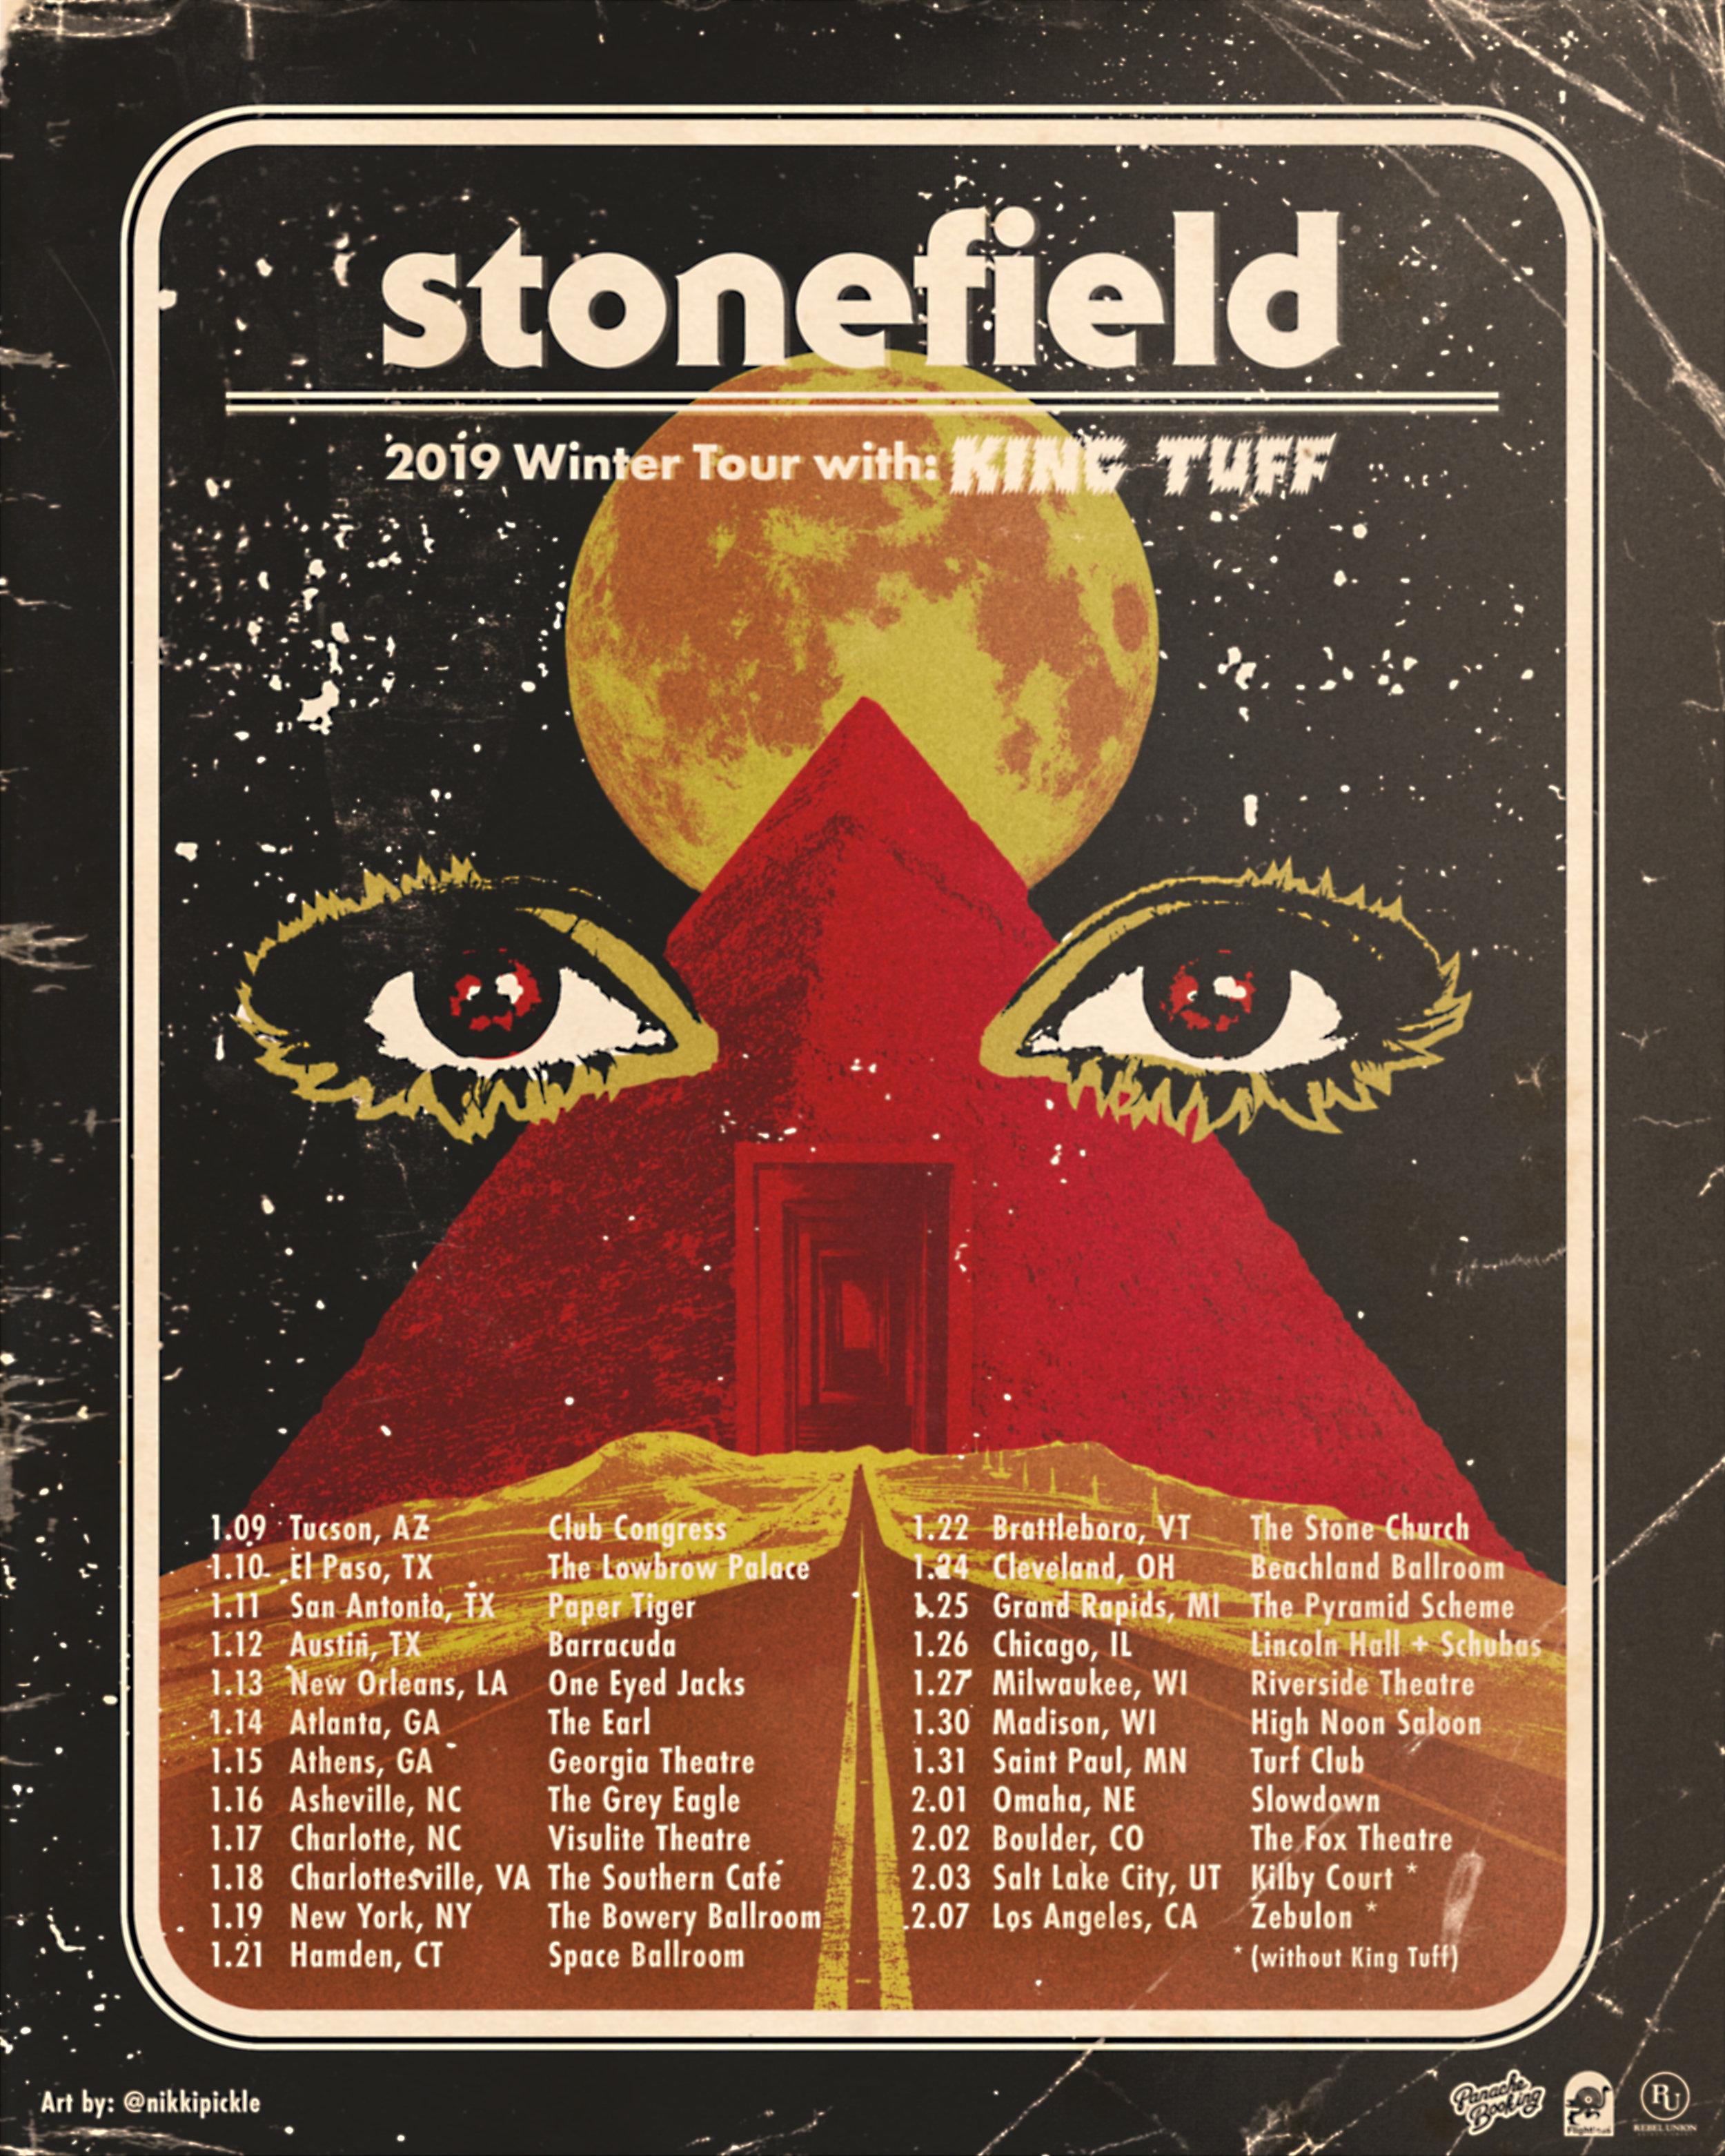 stonefield-king-tuff-instagram.jpg